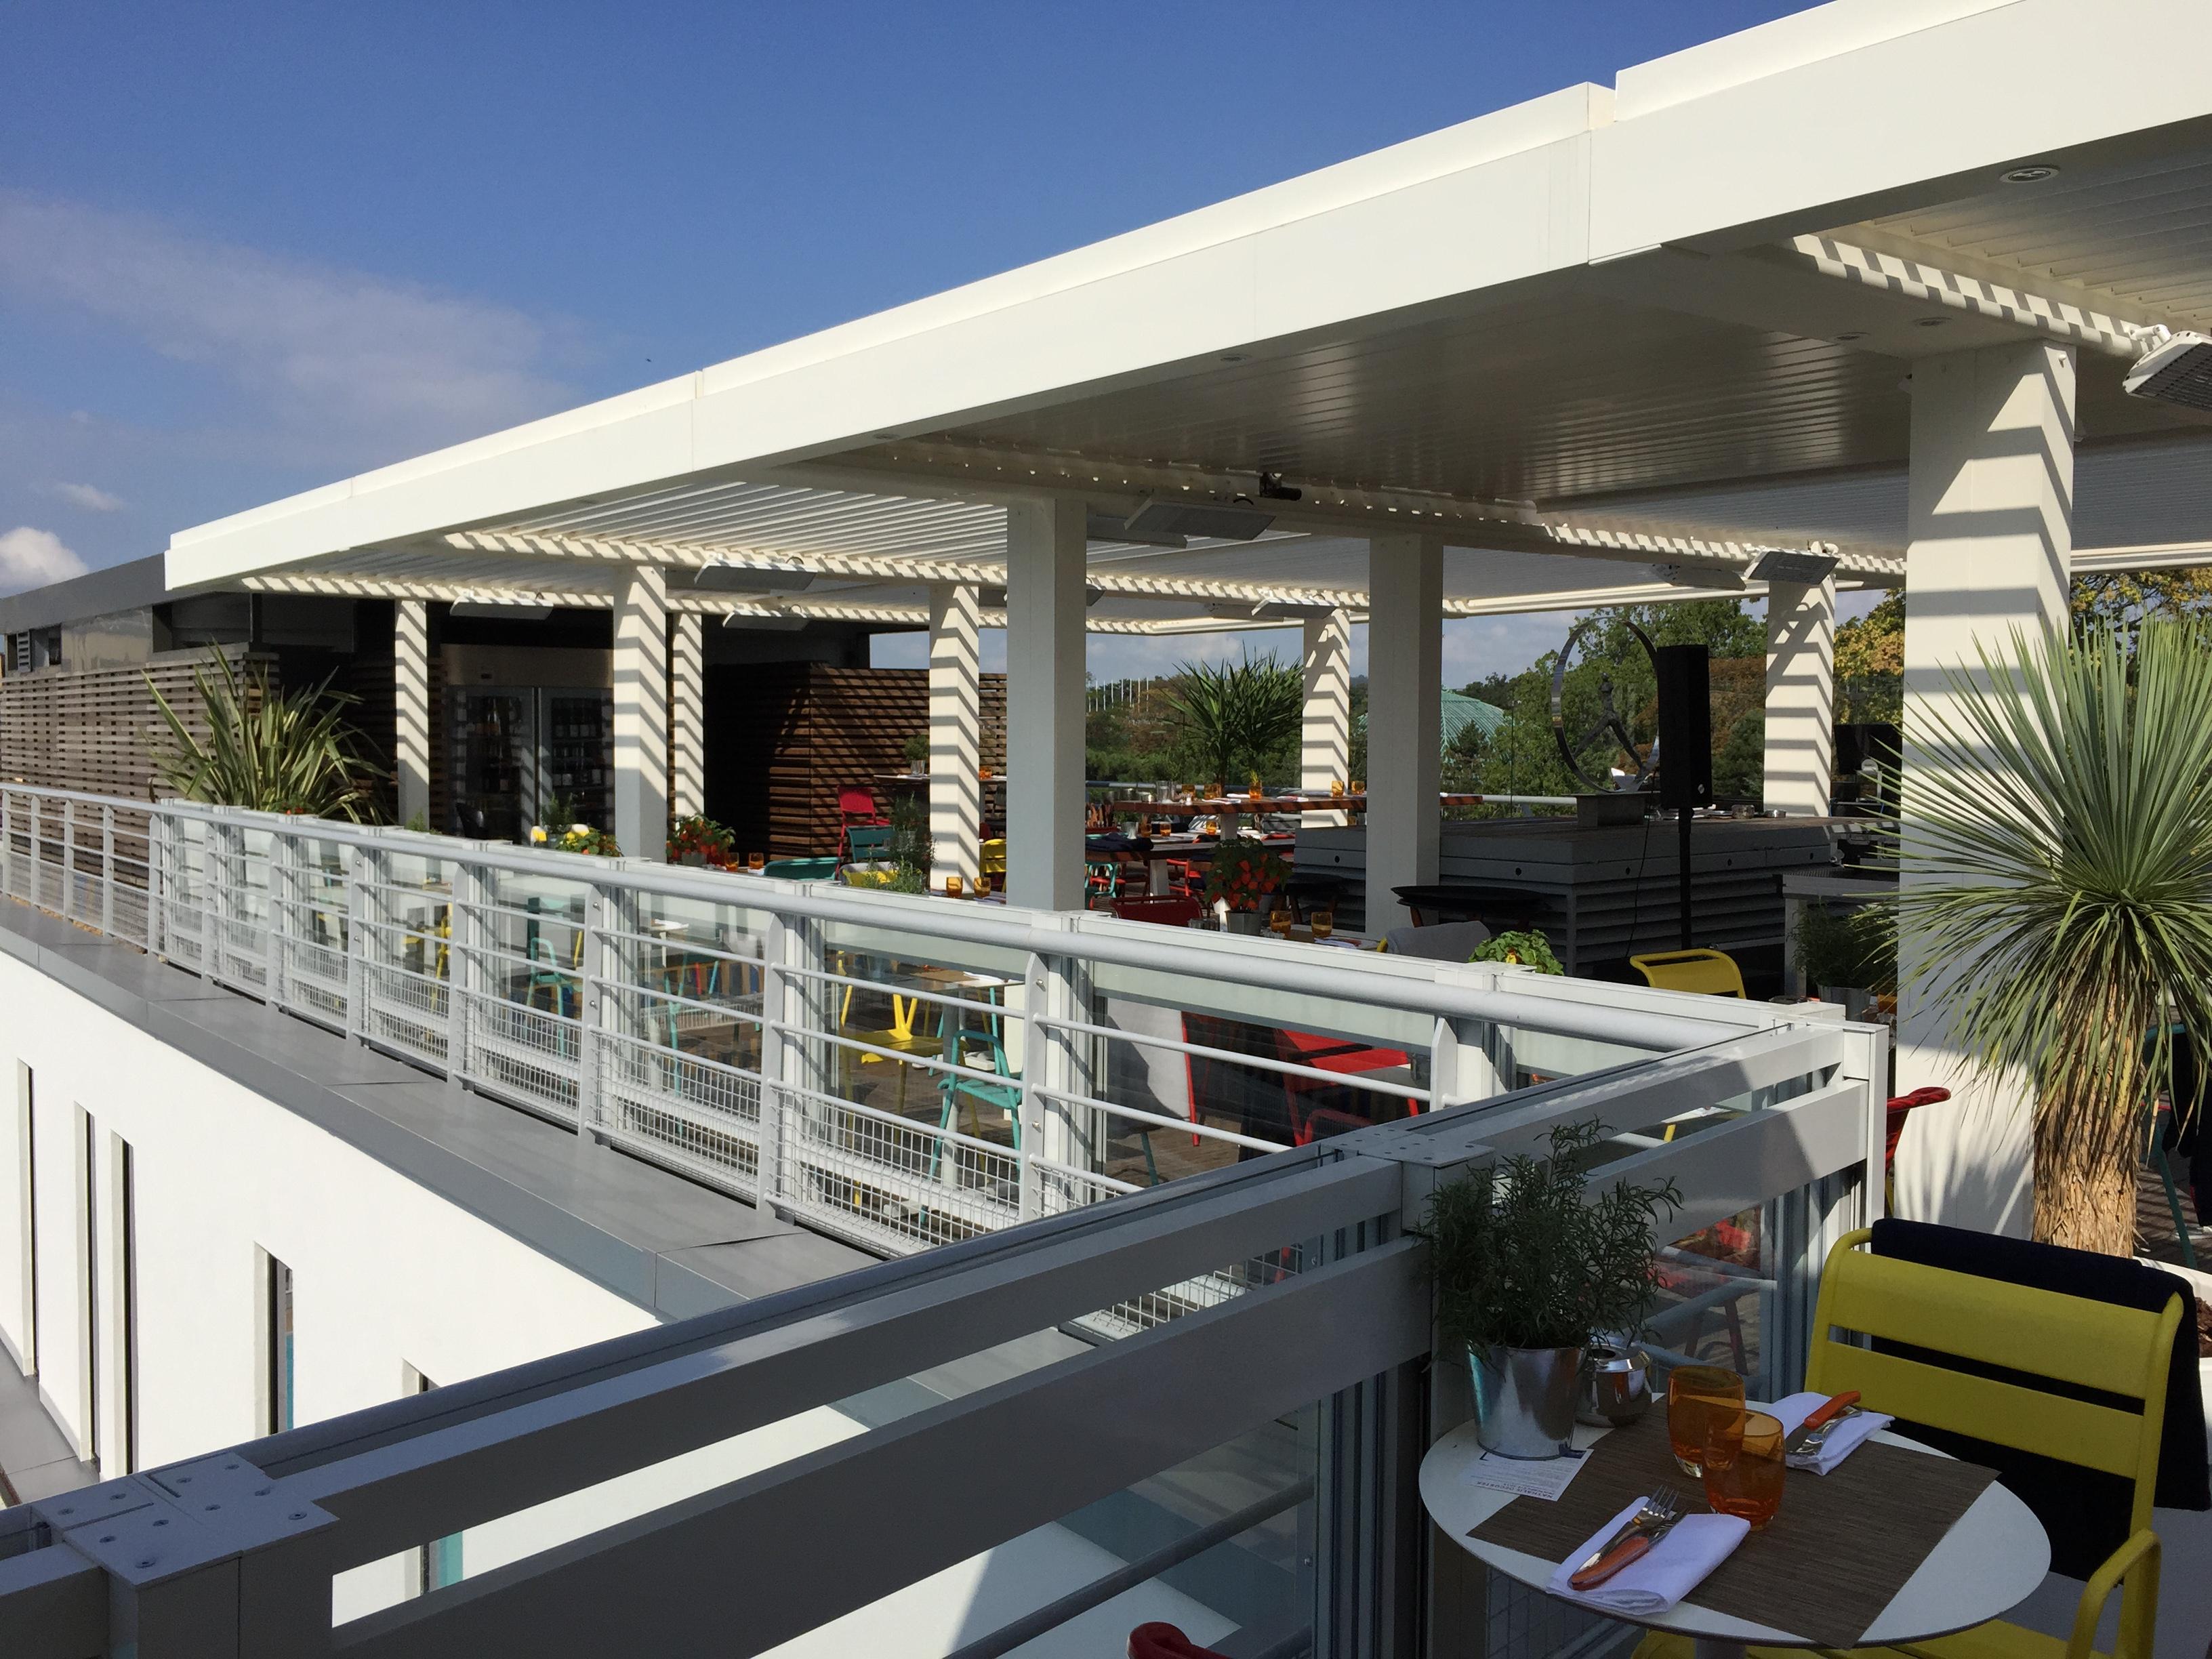 le restaurant toit terrasse molitor paris fancy oli. Black Bedroom Furniture Sets. Home Design Ideas